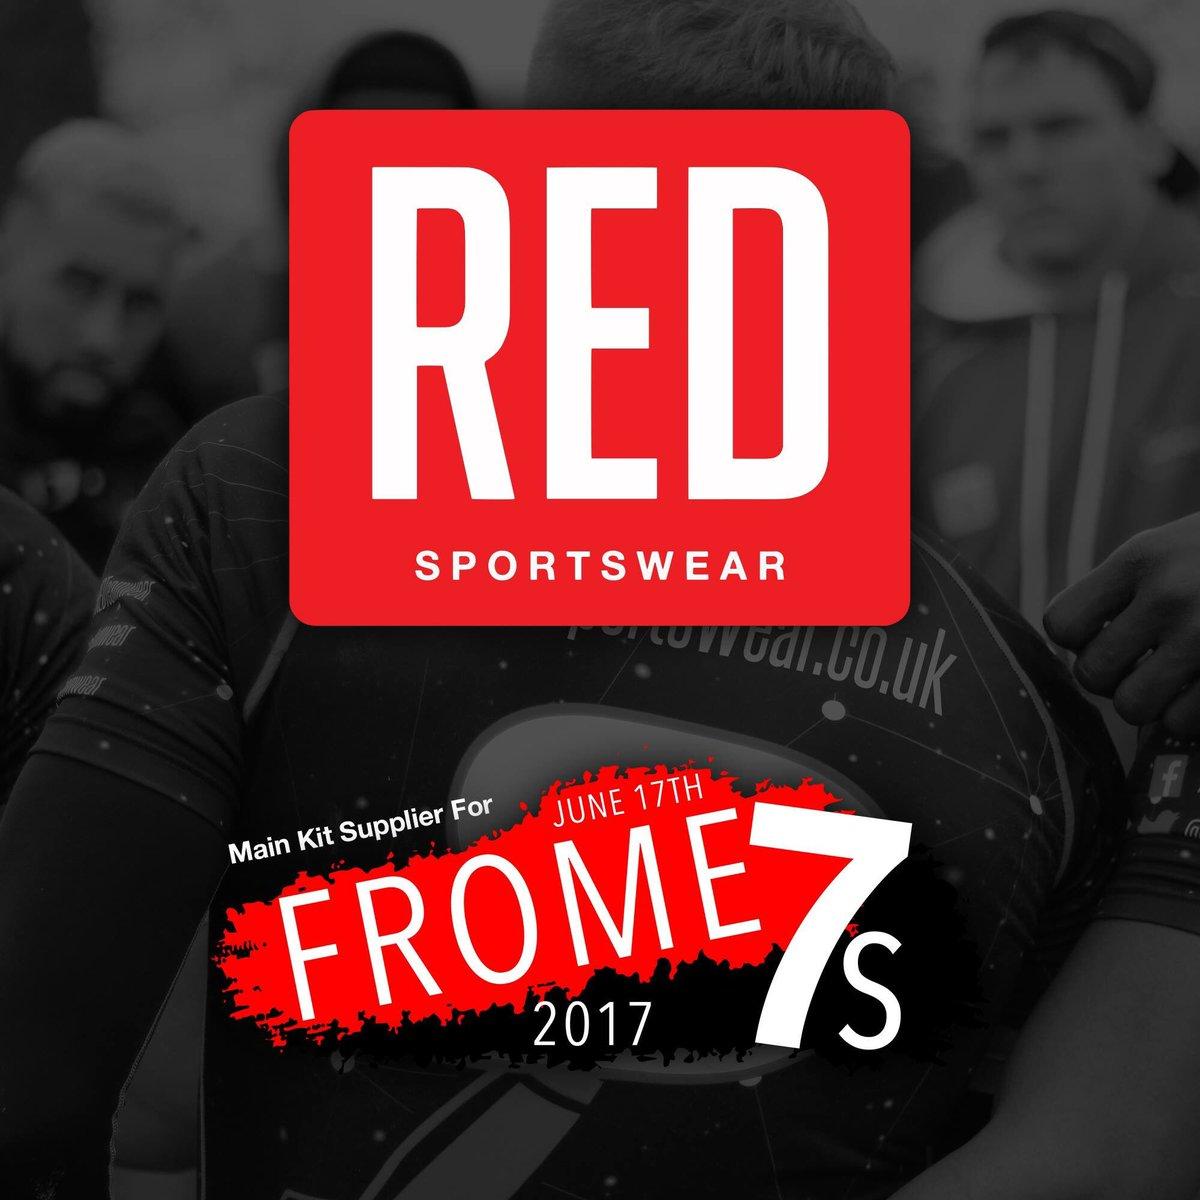 RED Teamwear